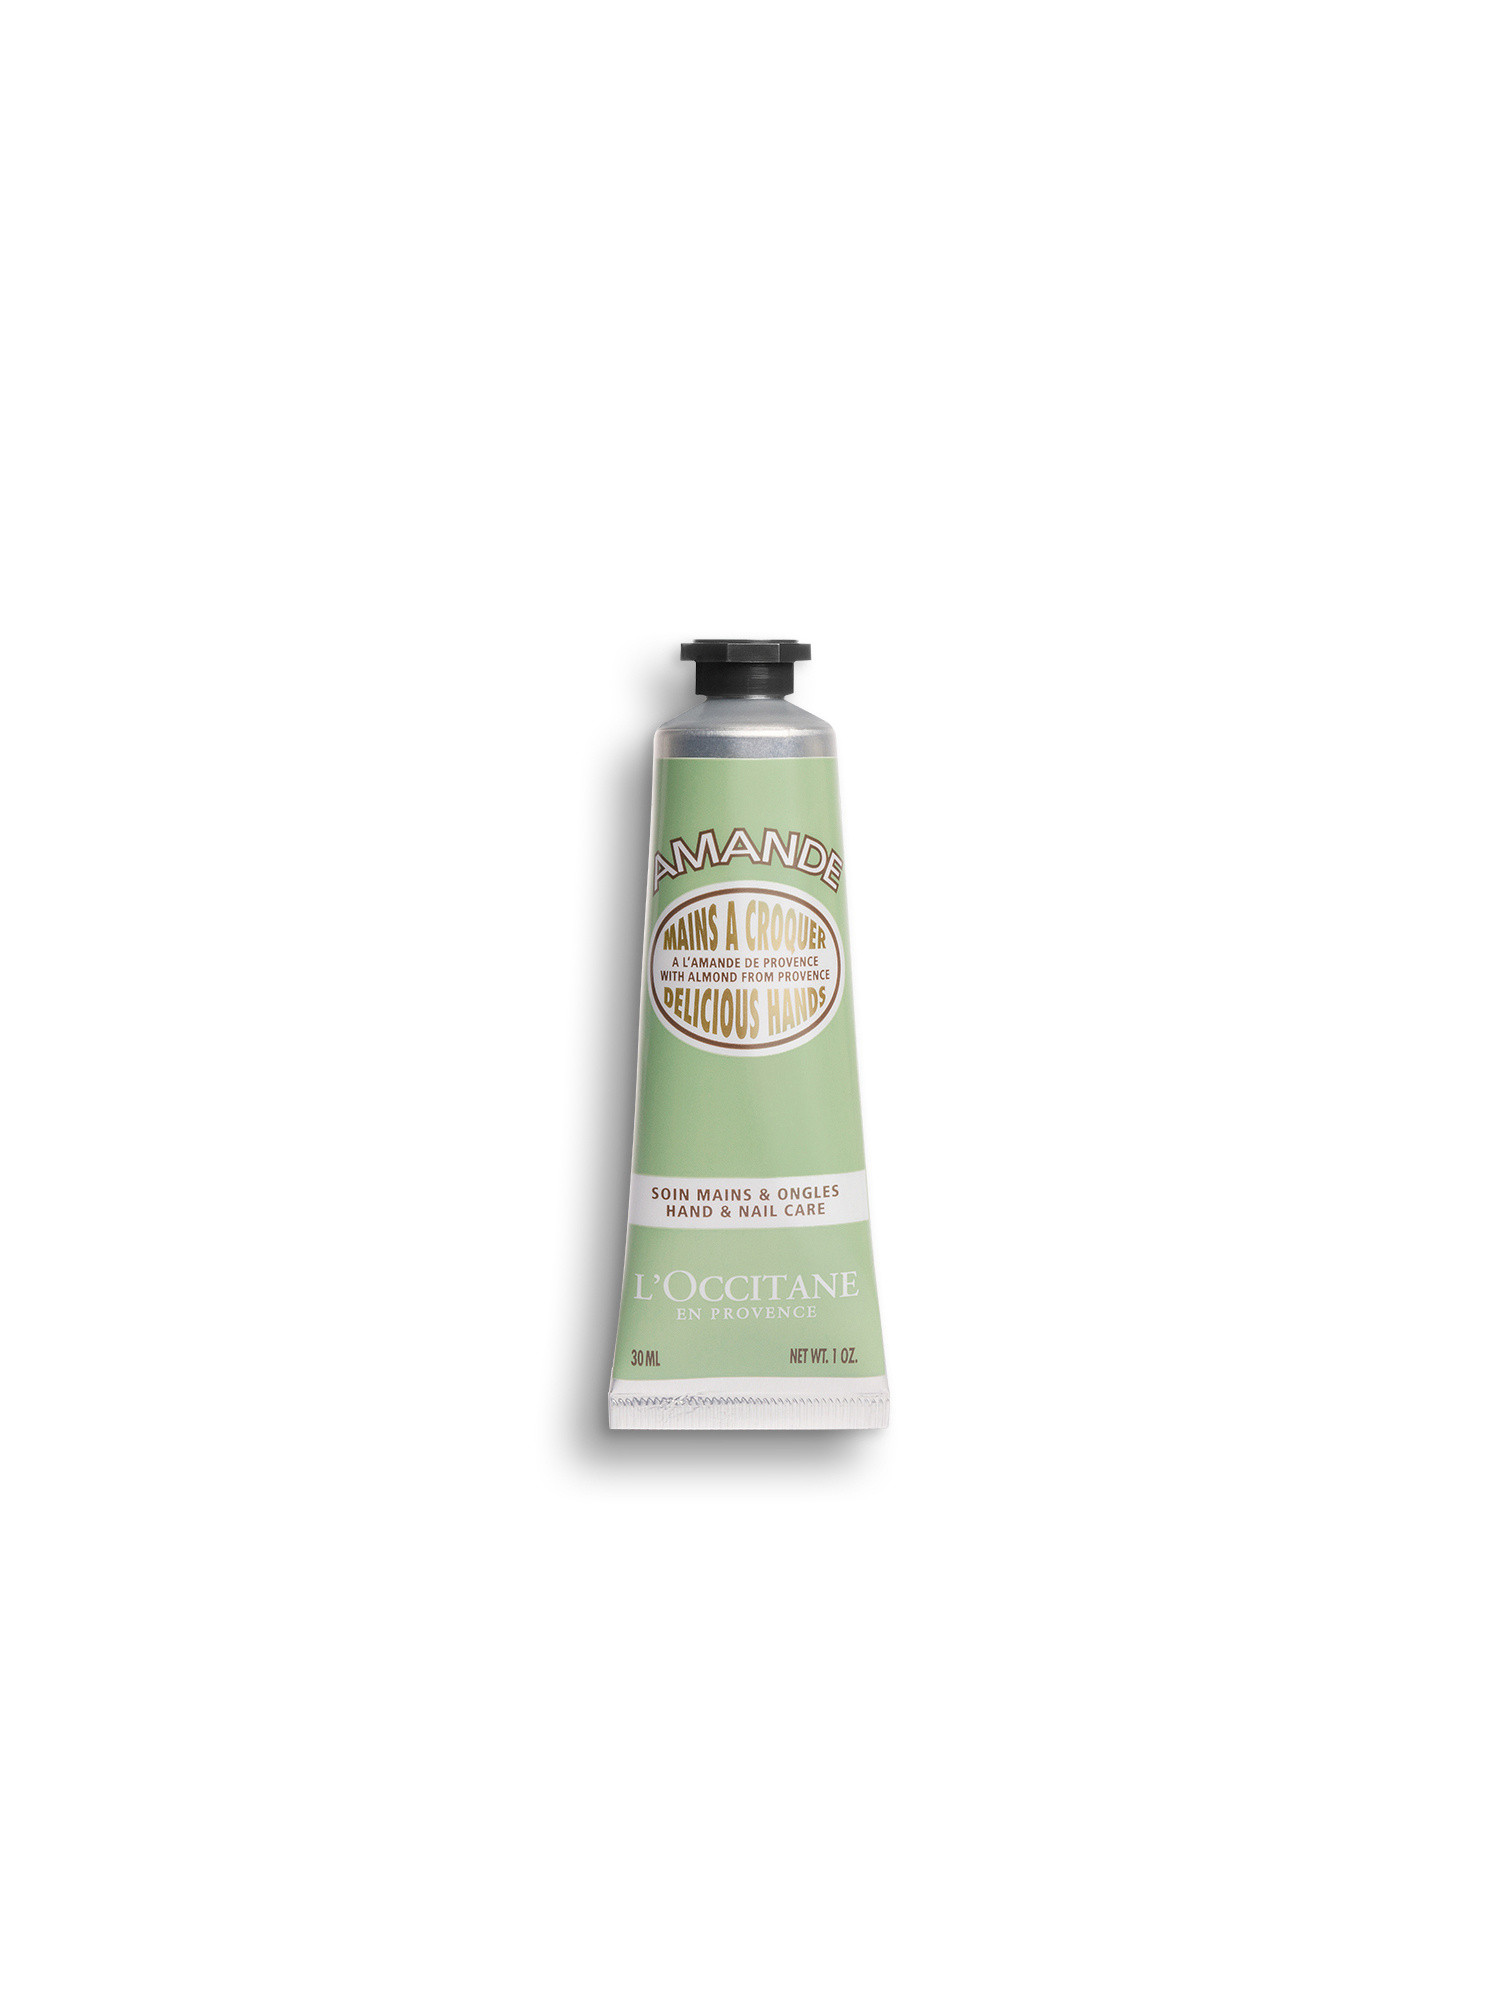 Crema Mani Mandorla 30 ml, Trasparente, large image number 0